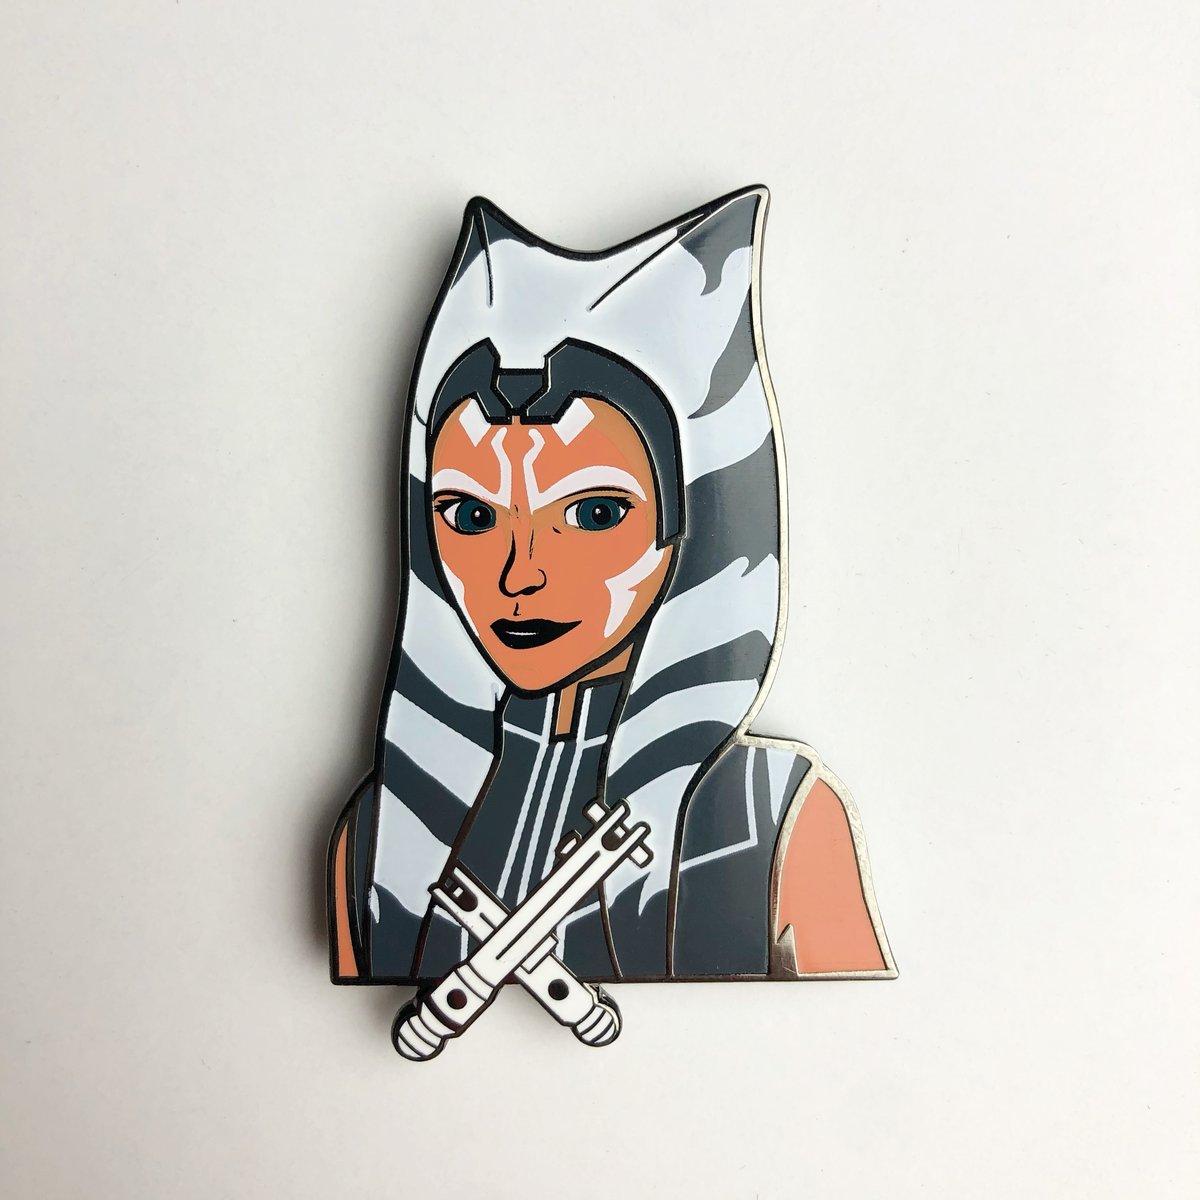 Image of 'Clone Wars Ahsoka' Pin